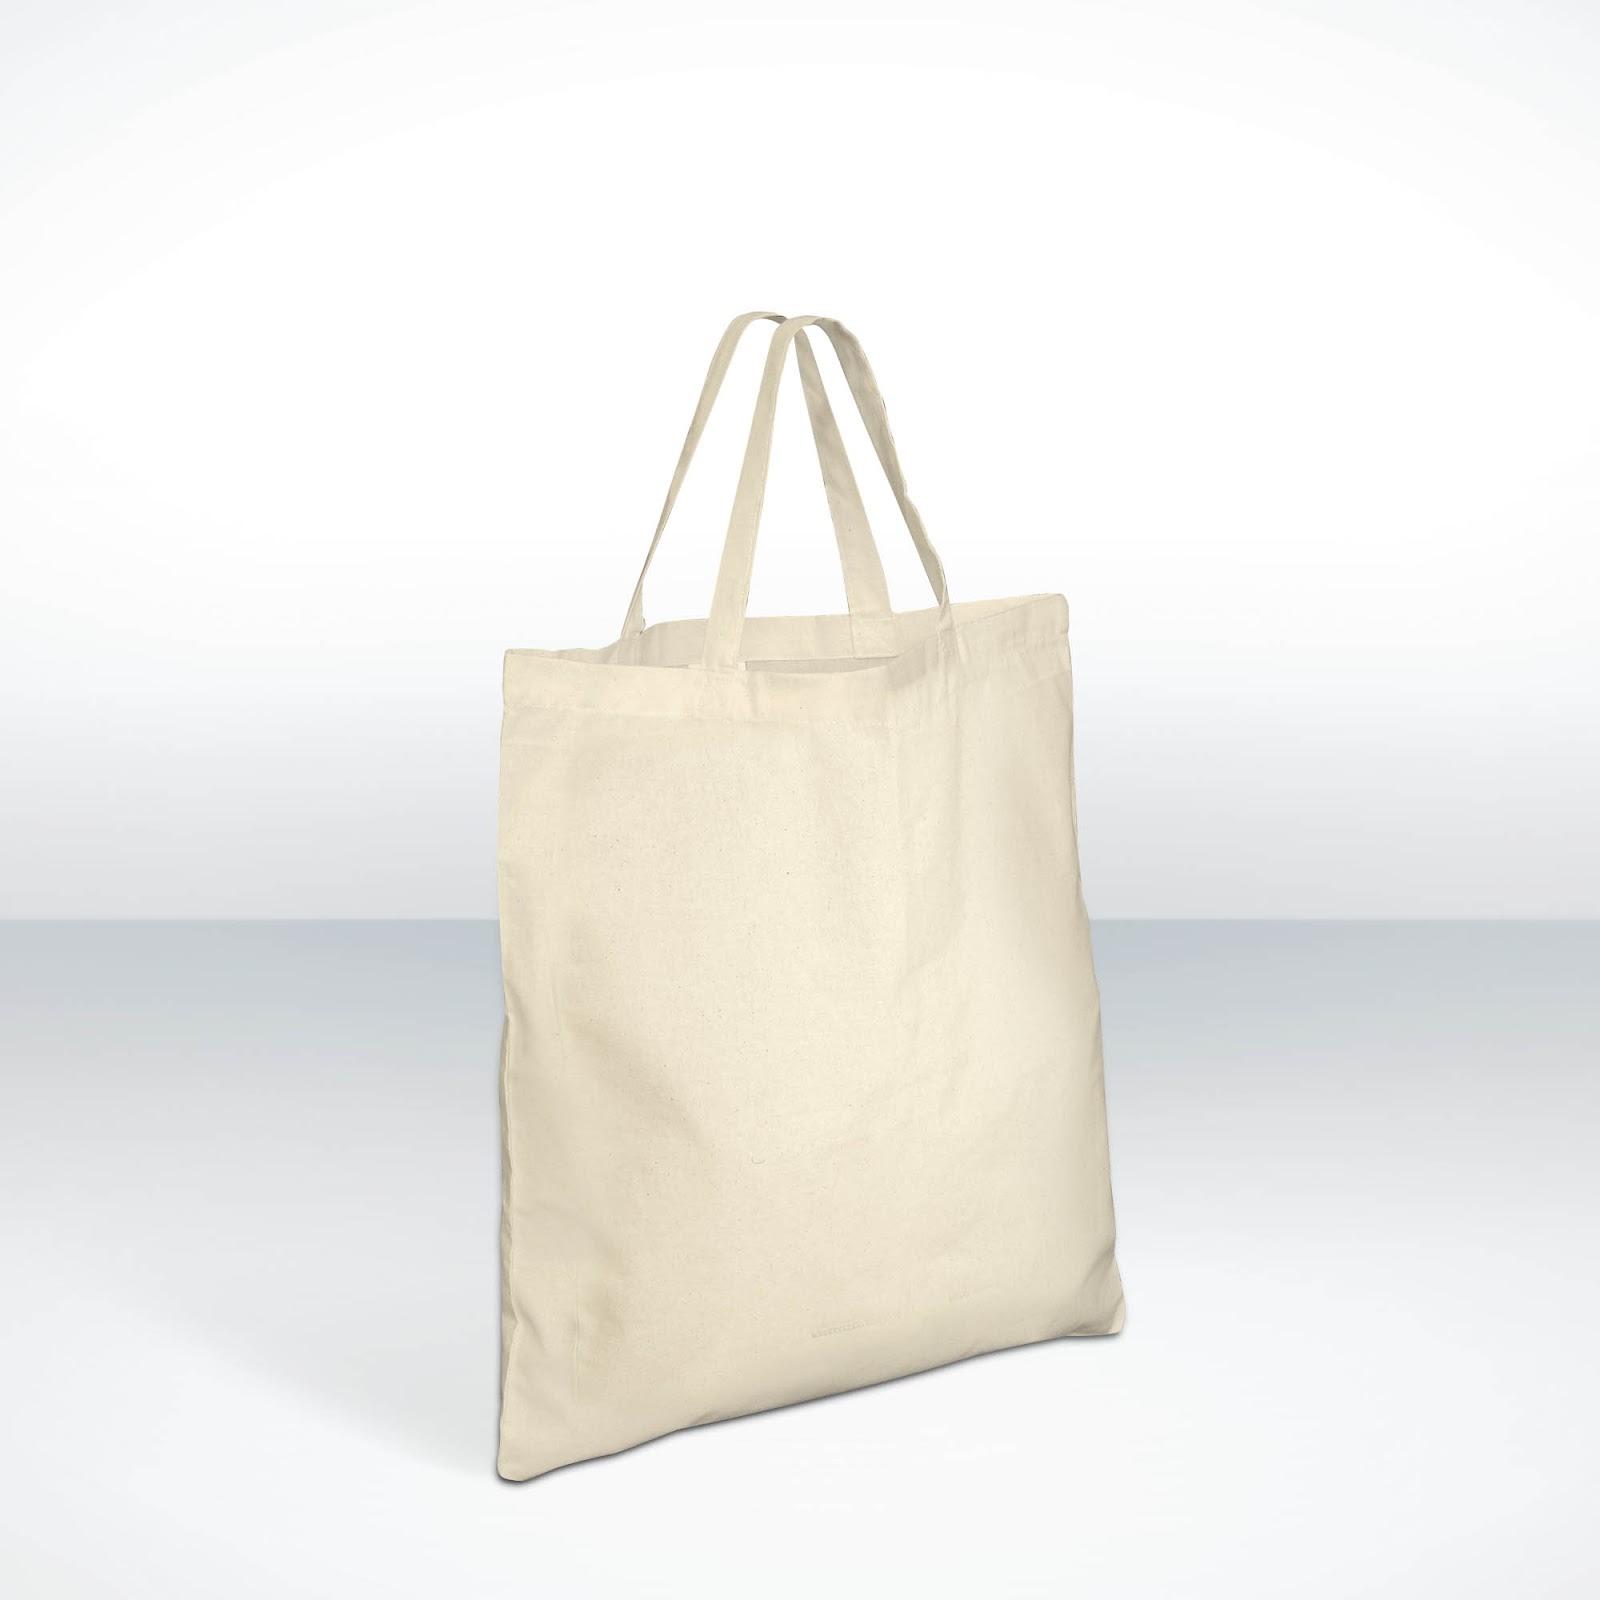 Printed Cotton Bags (Short Handles)